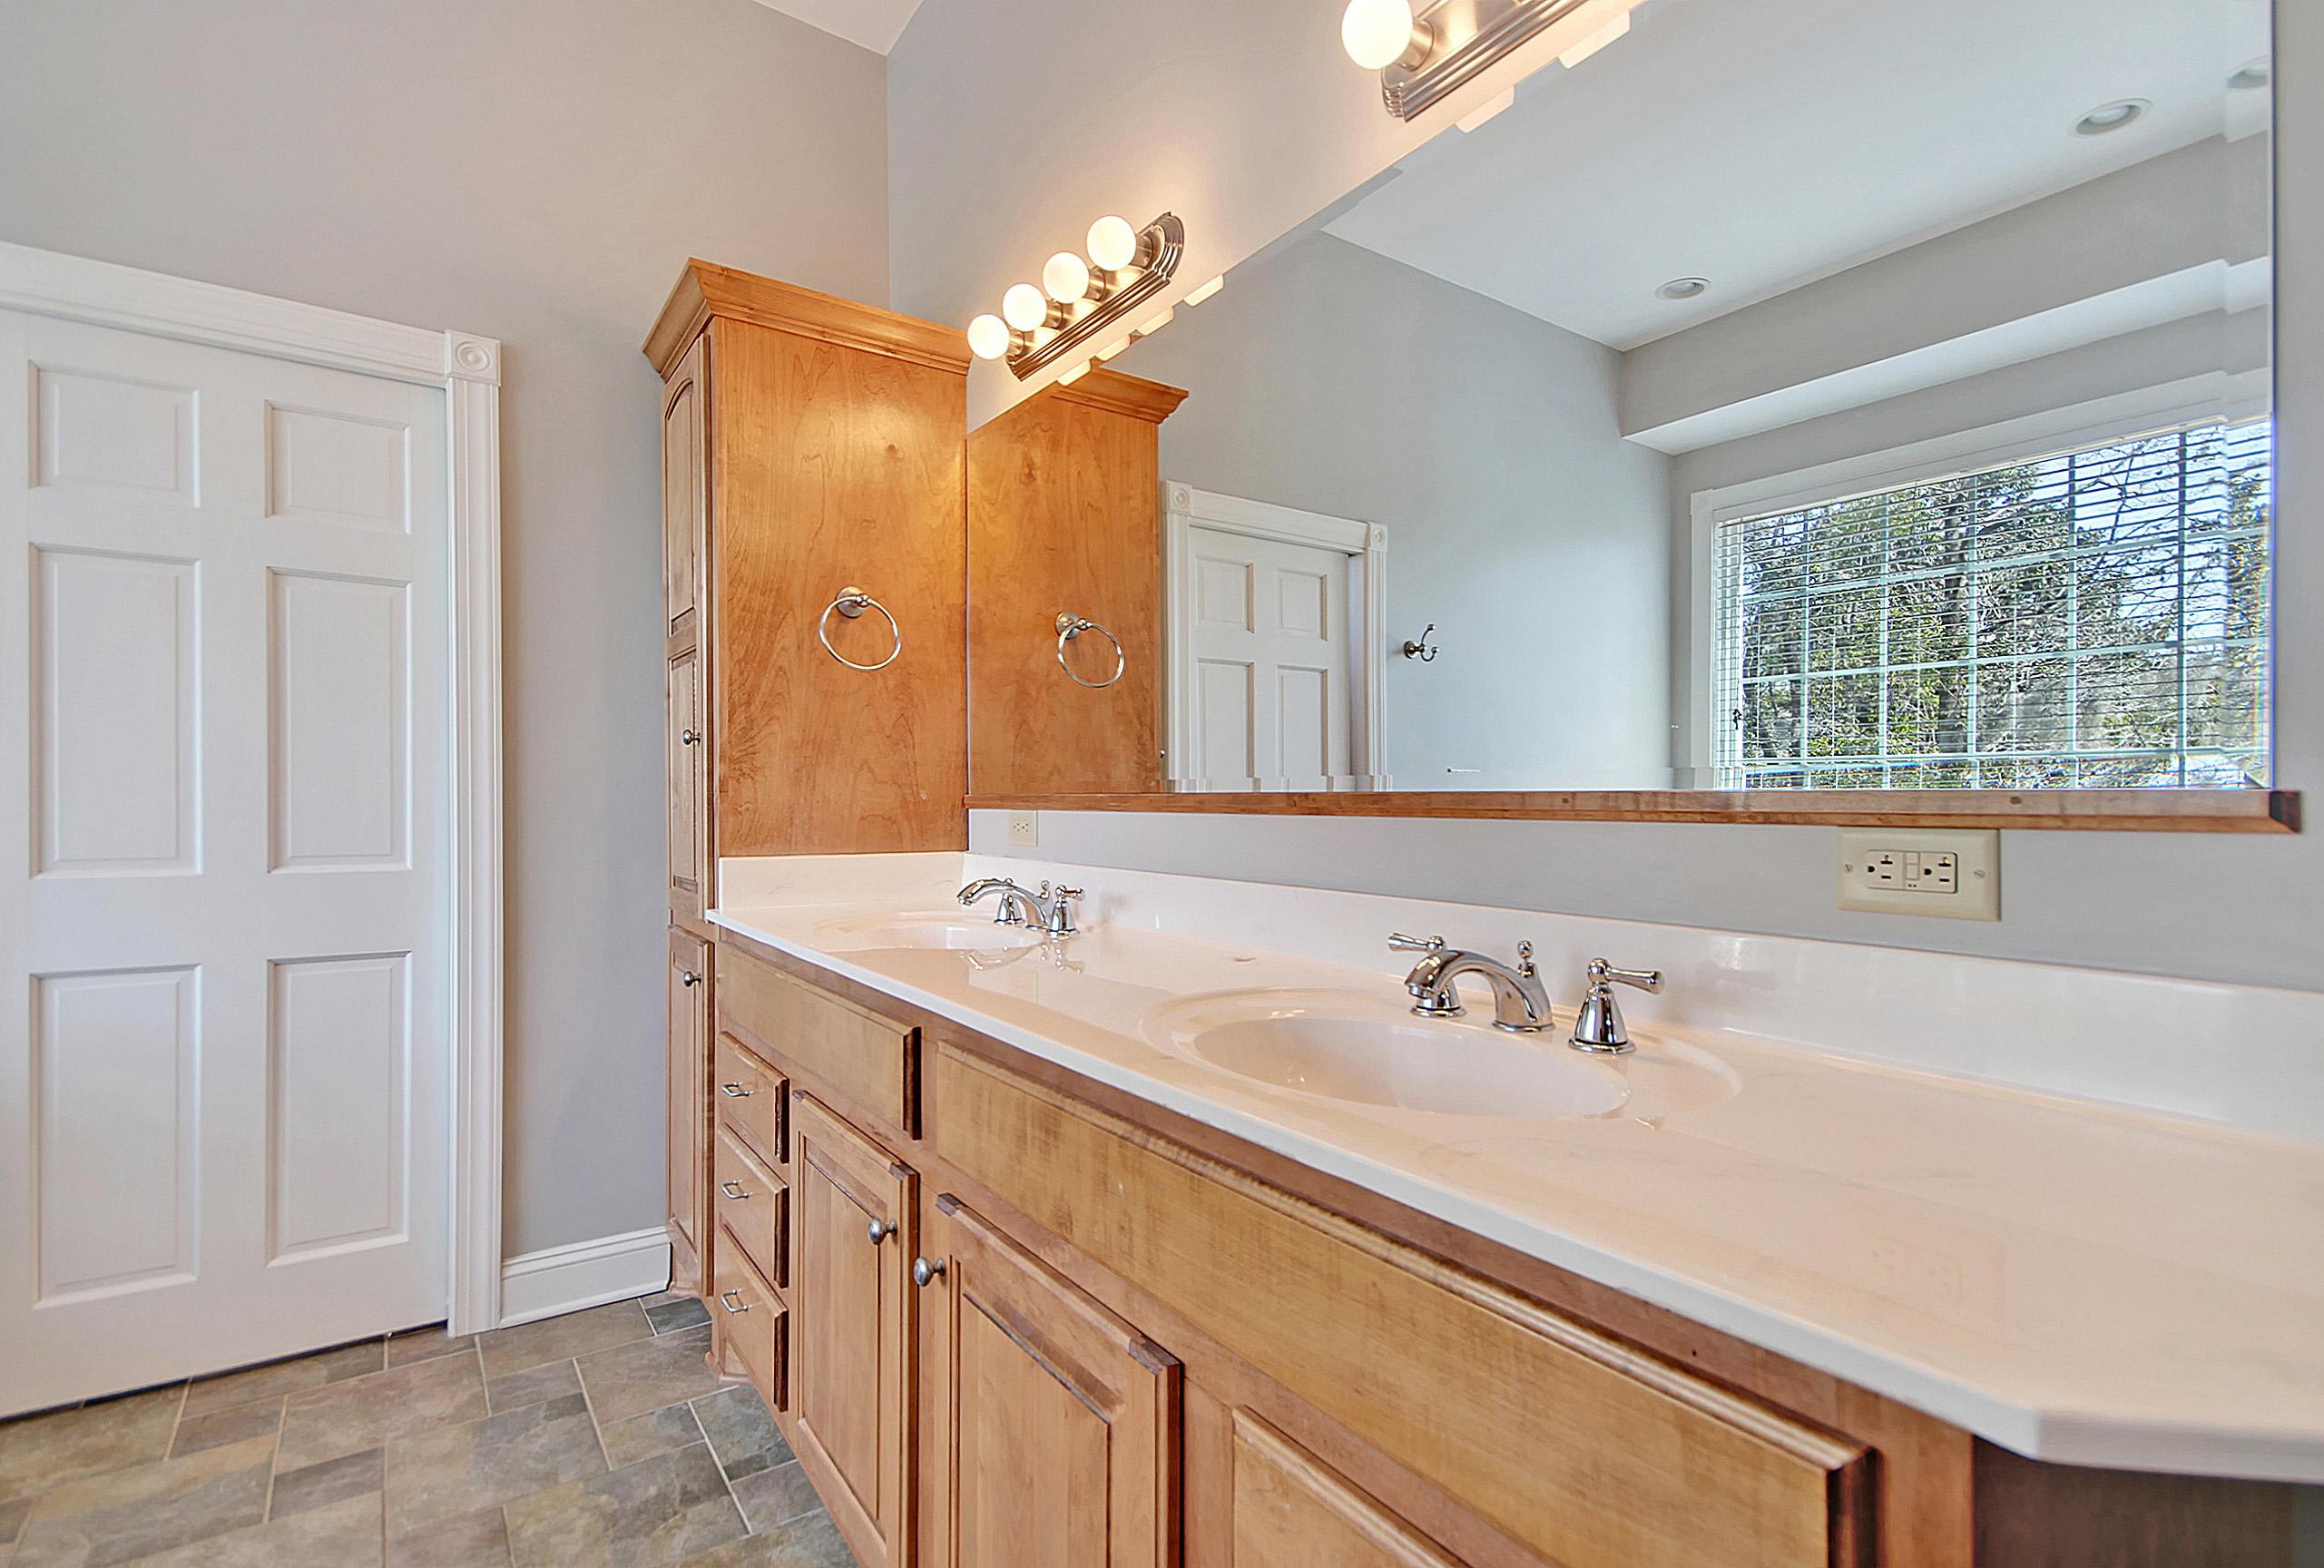 Cross Subd (Longpoint) Homes For Sale - 1191 Longpoint, Cross, SC - 45